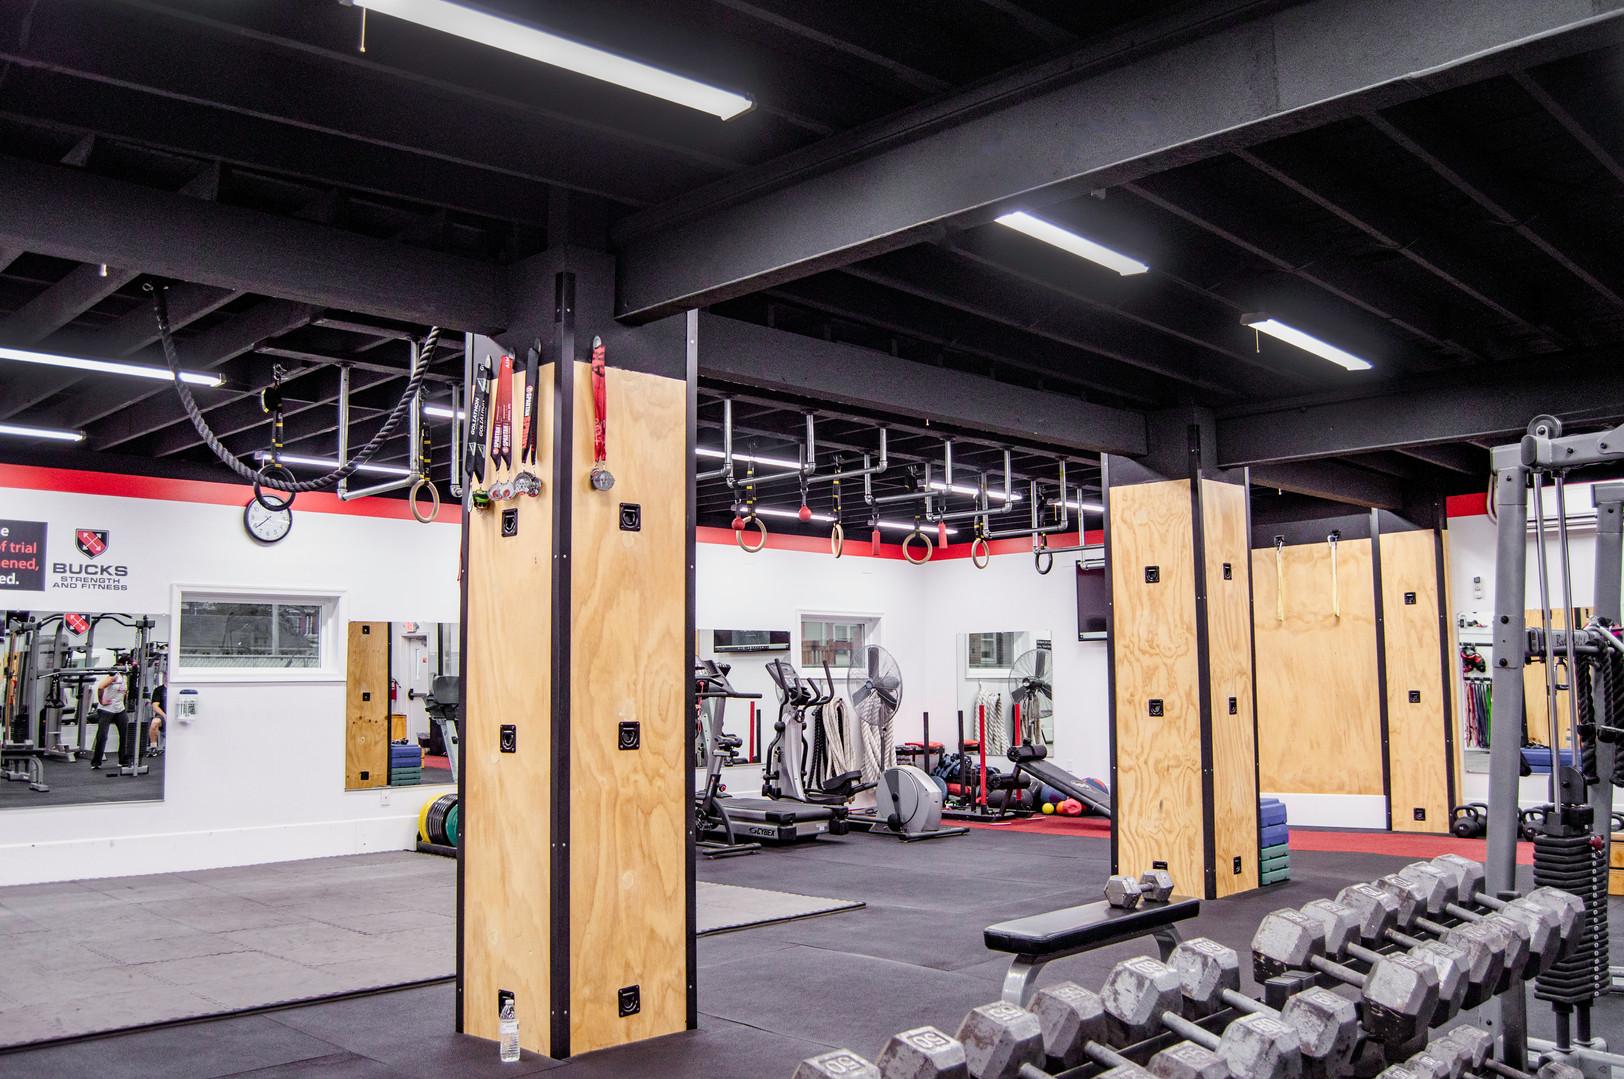 interior-bucks-strength-fitness-4.jpg